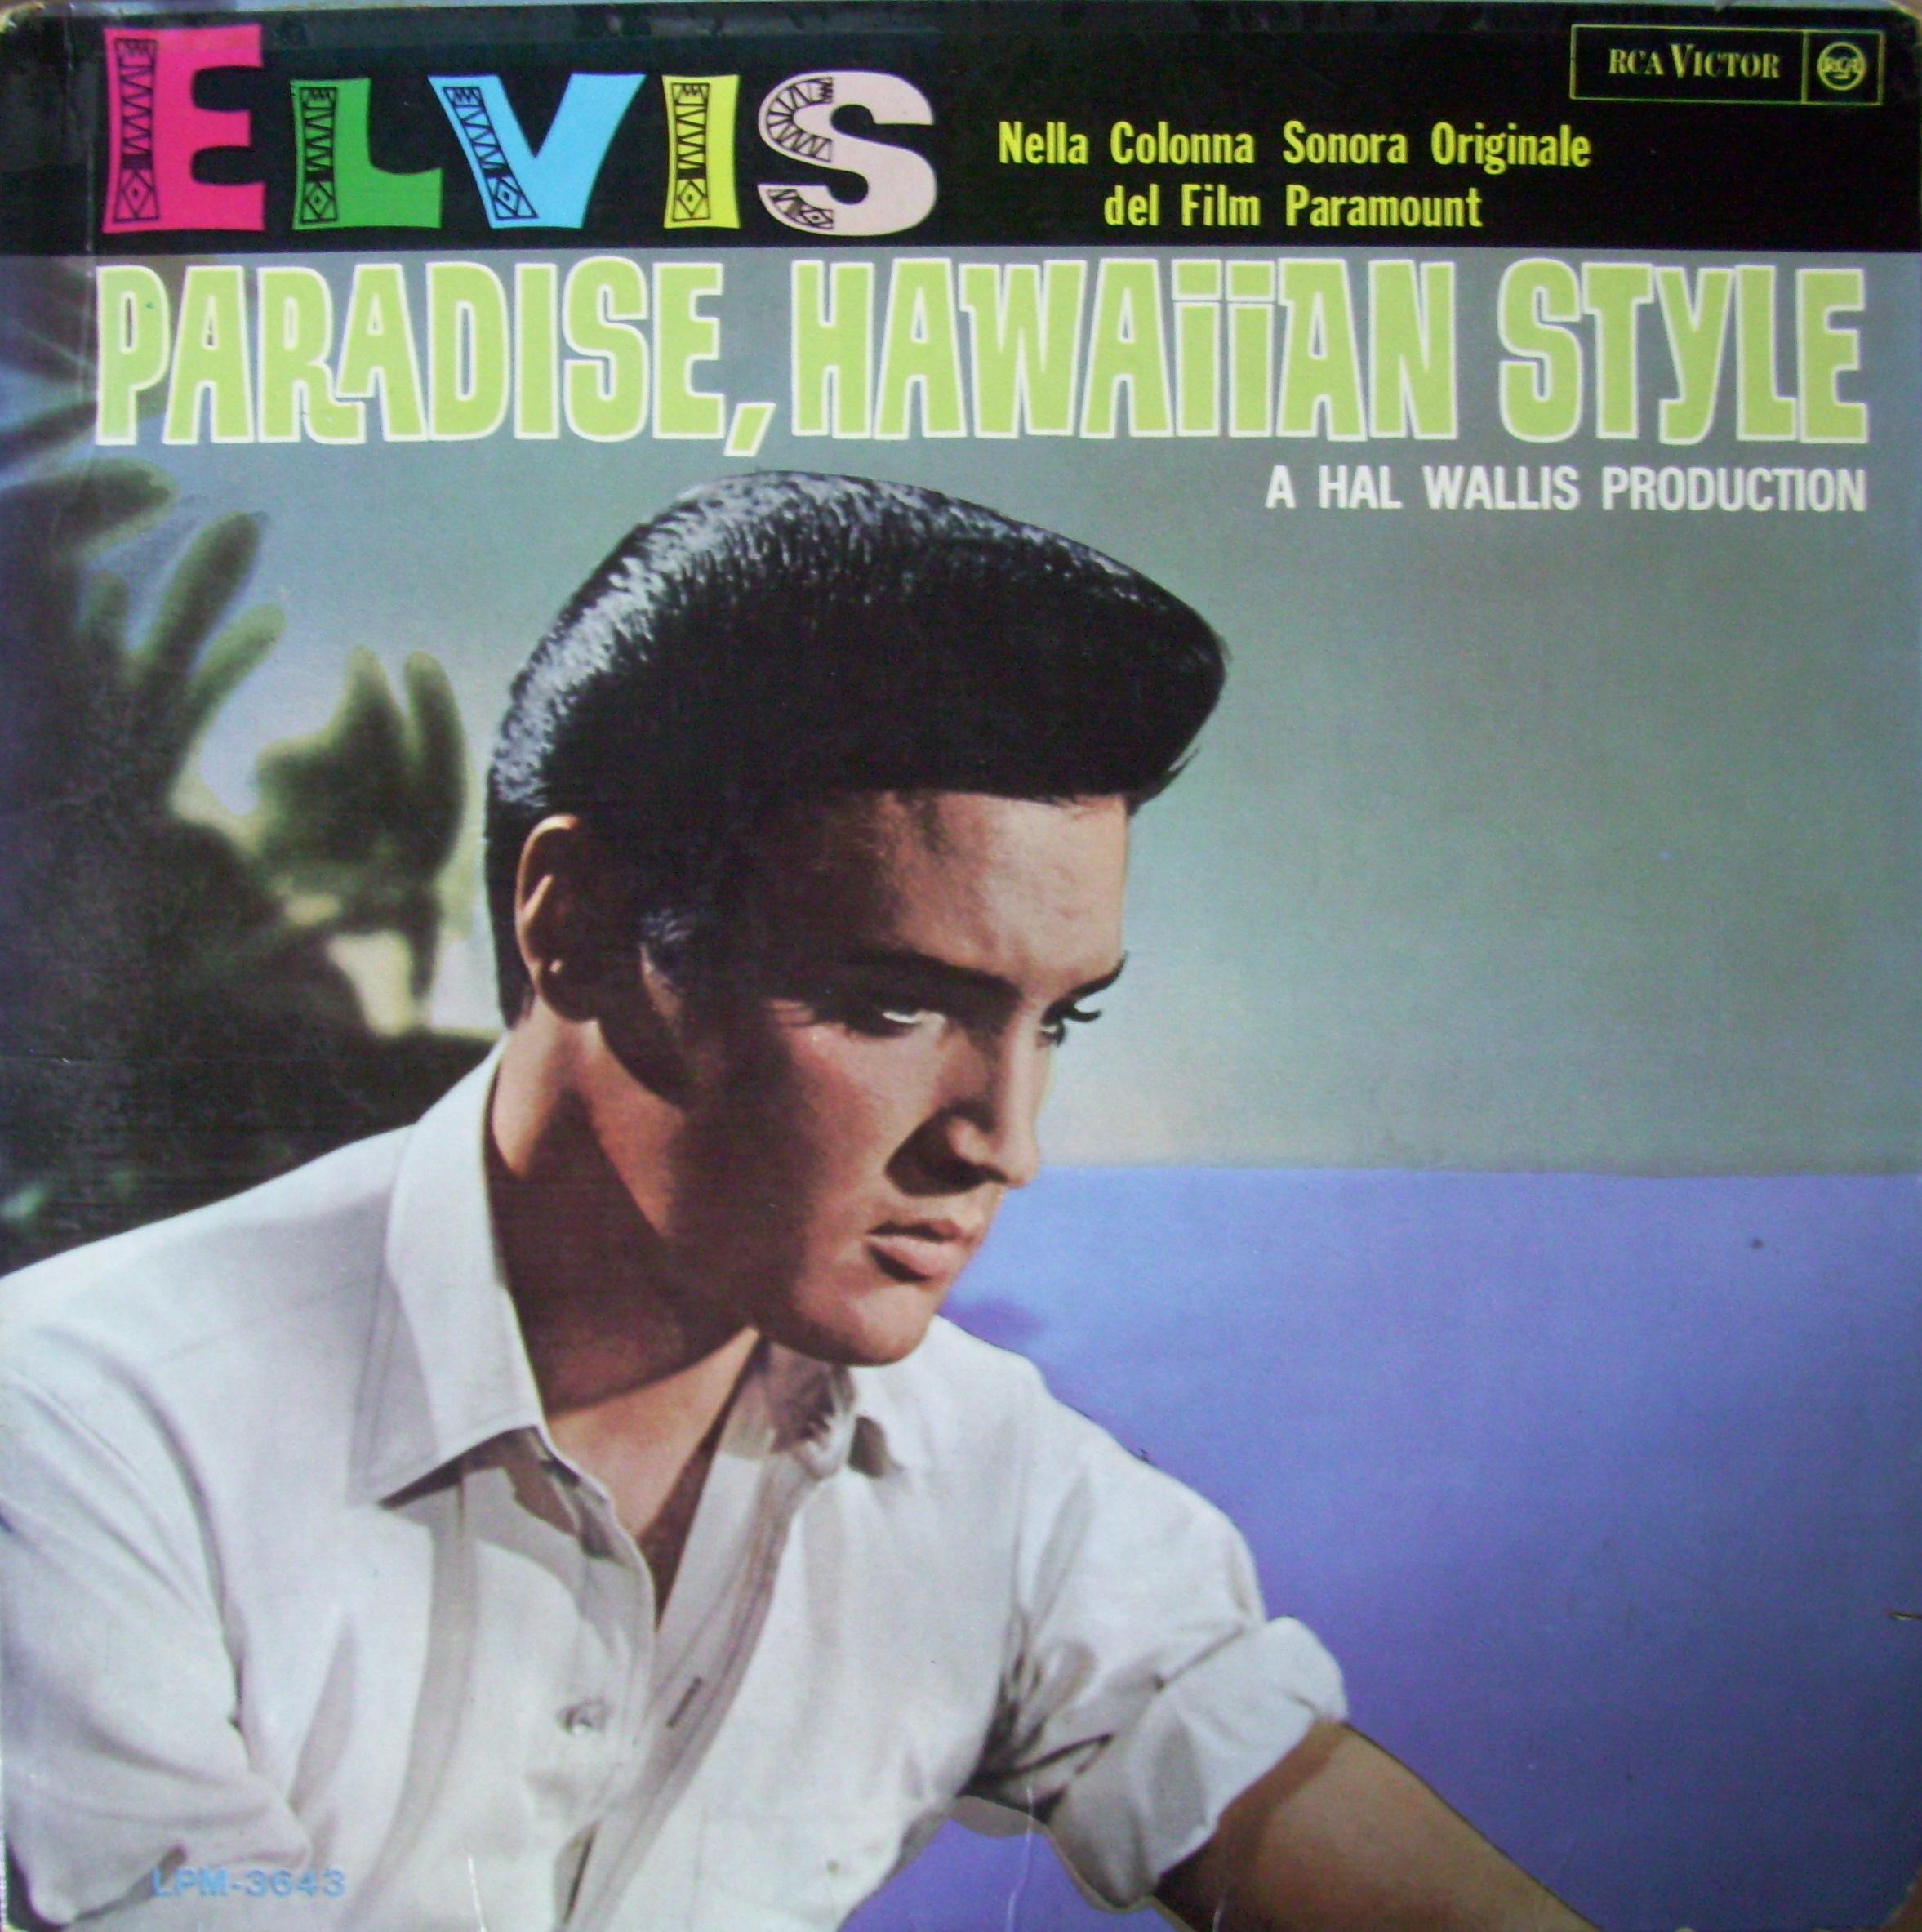 PARADISE, HAWAIIAN STYLE Iw7zsjpw